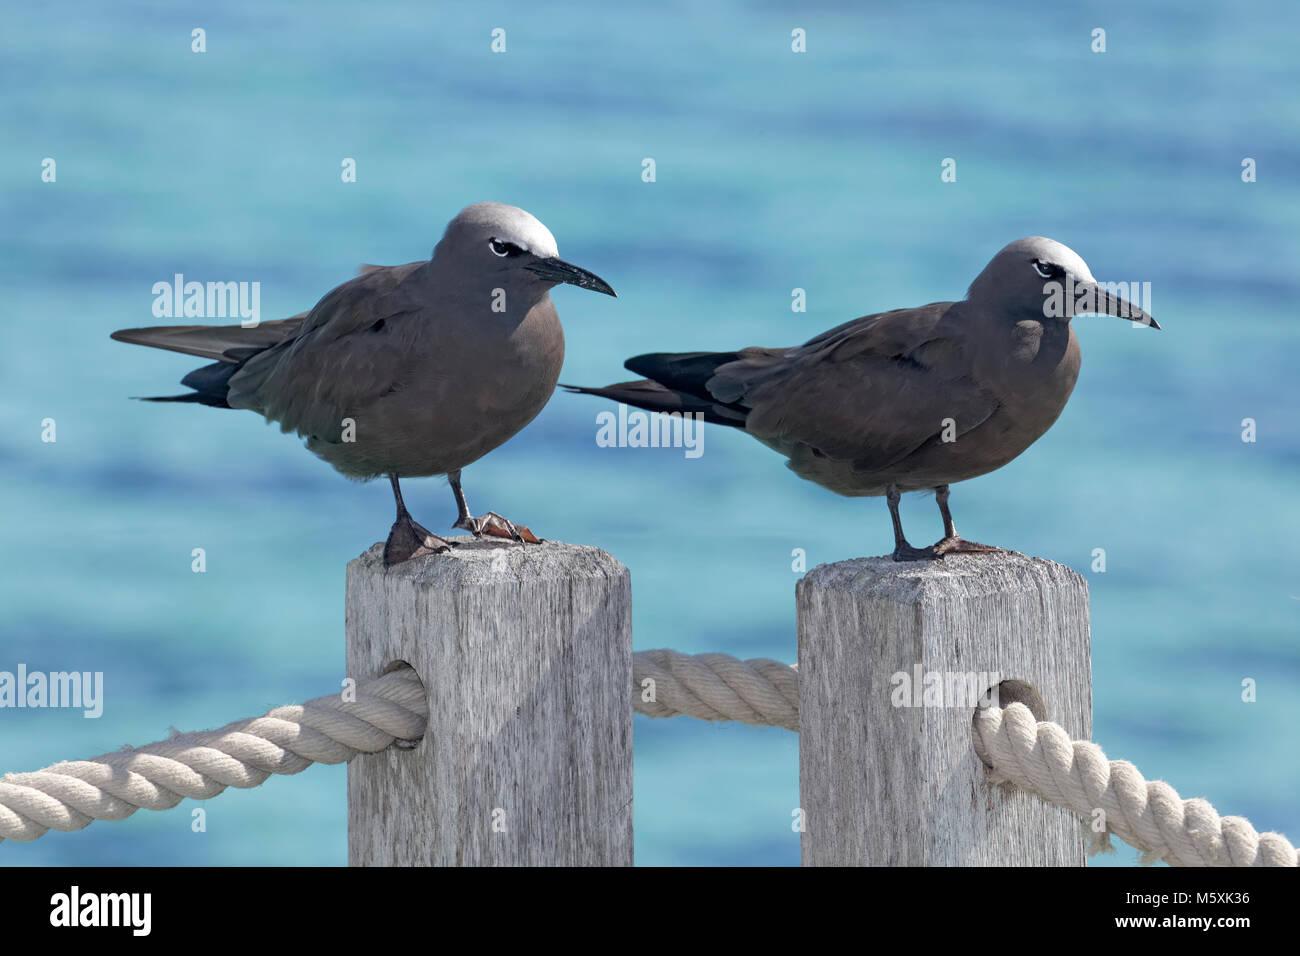 Lava gulls (Larus fuliginousus), sitting on handrail, Moorea, French Polynesia - Stock Image